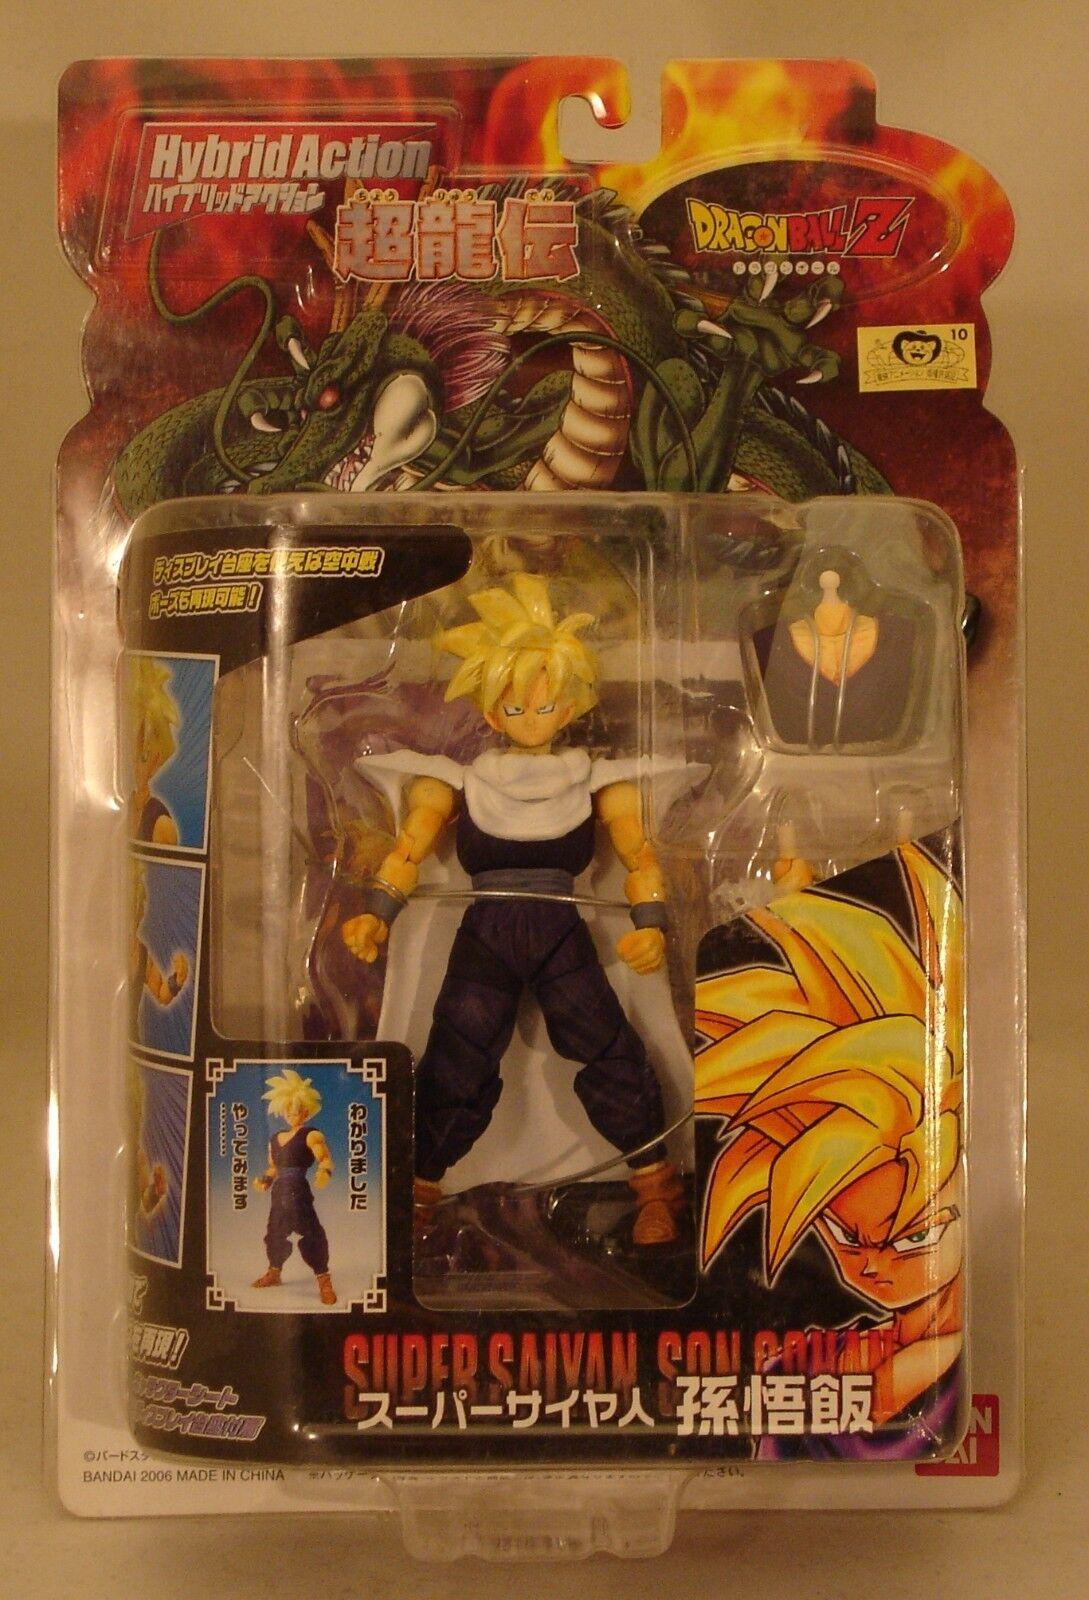 2006 Dragon Ball Z Hybrid Action SUPER SAIYAN SON GOHAN 4  action figure Bandai